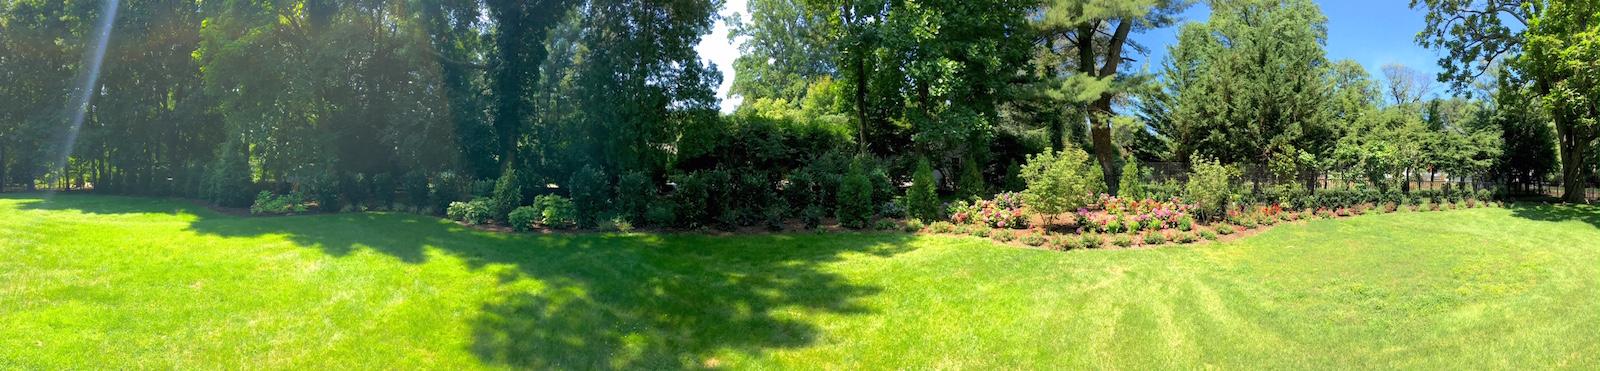 Lawn transformed by landscape design NJ